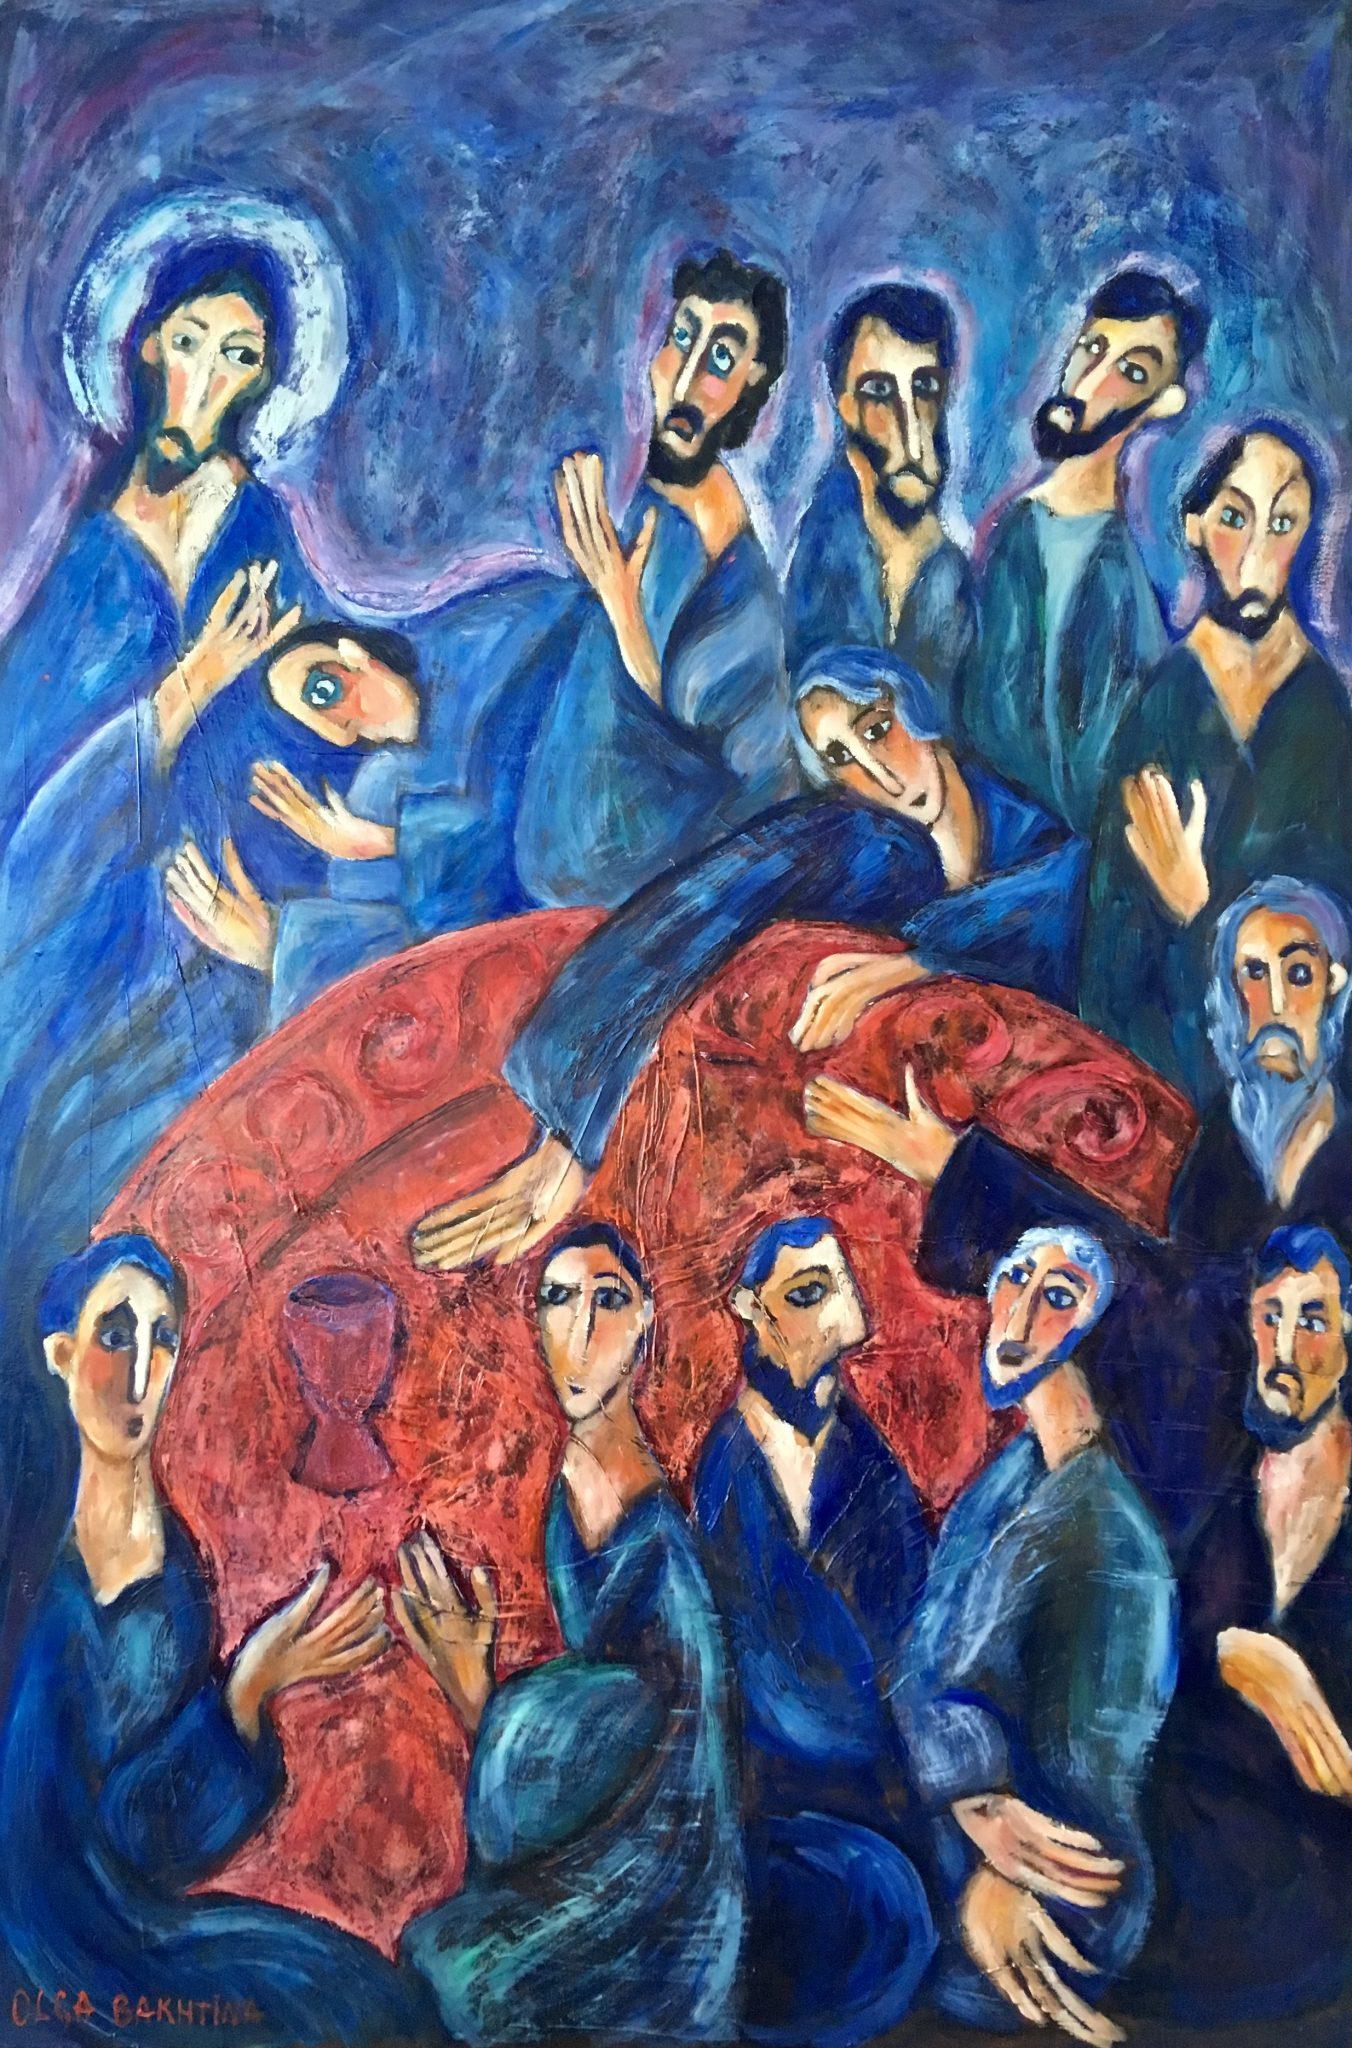 The Last Supper painting | Olga Bakhtina